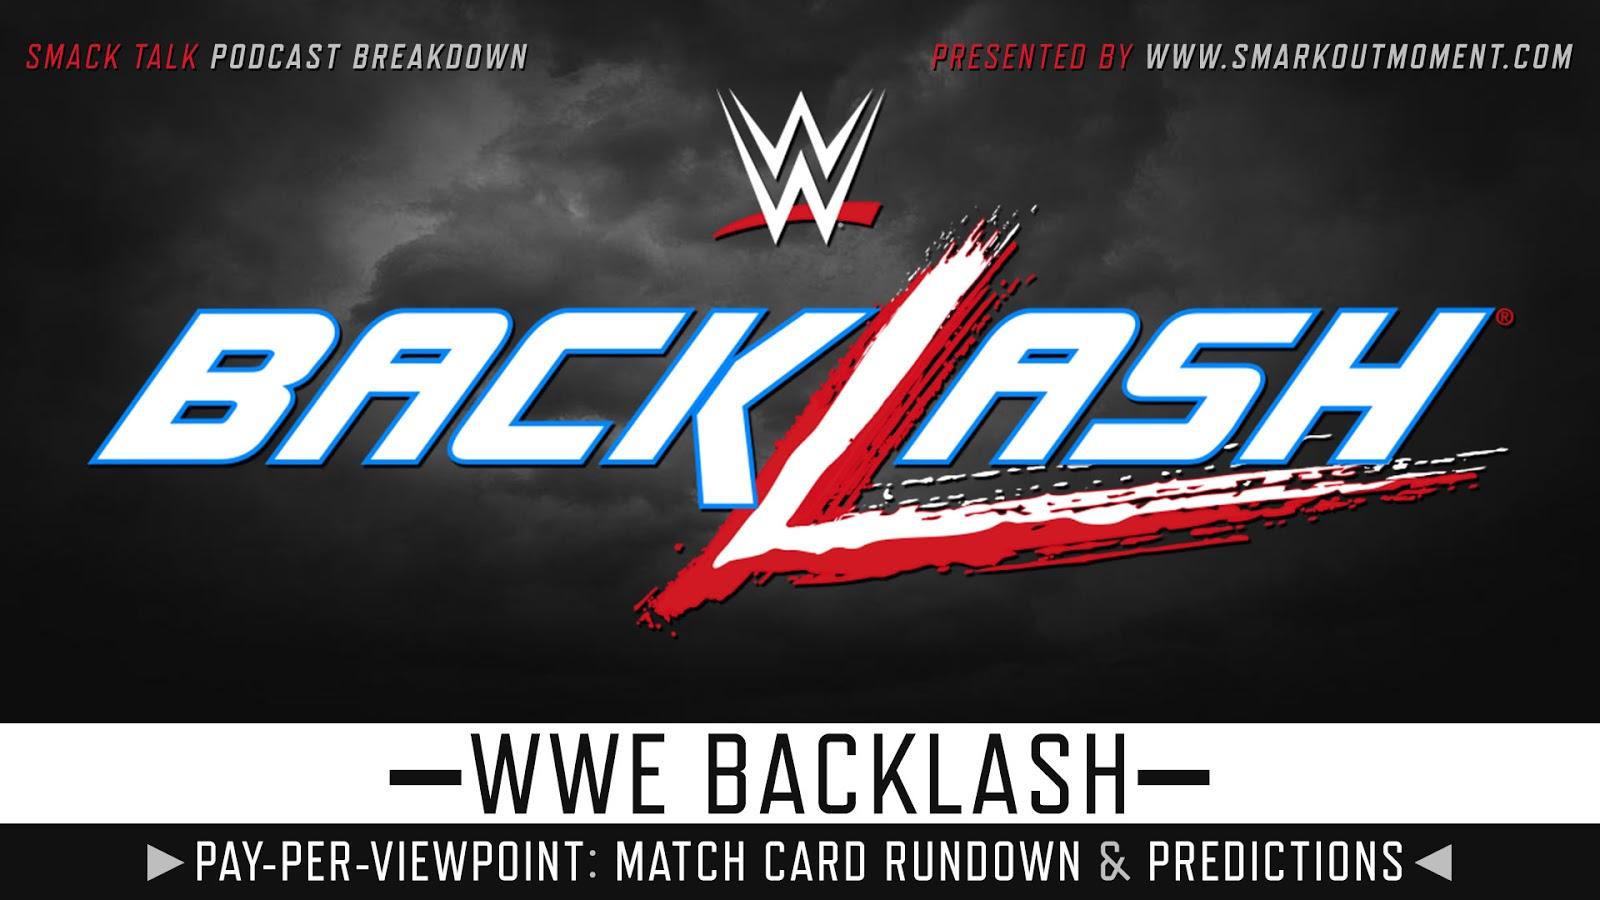 WWE WrestleMania Backlash 2021 spoilers podcast